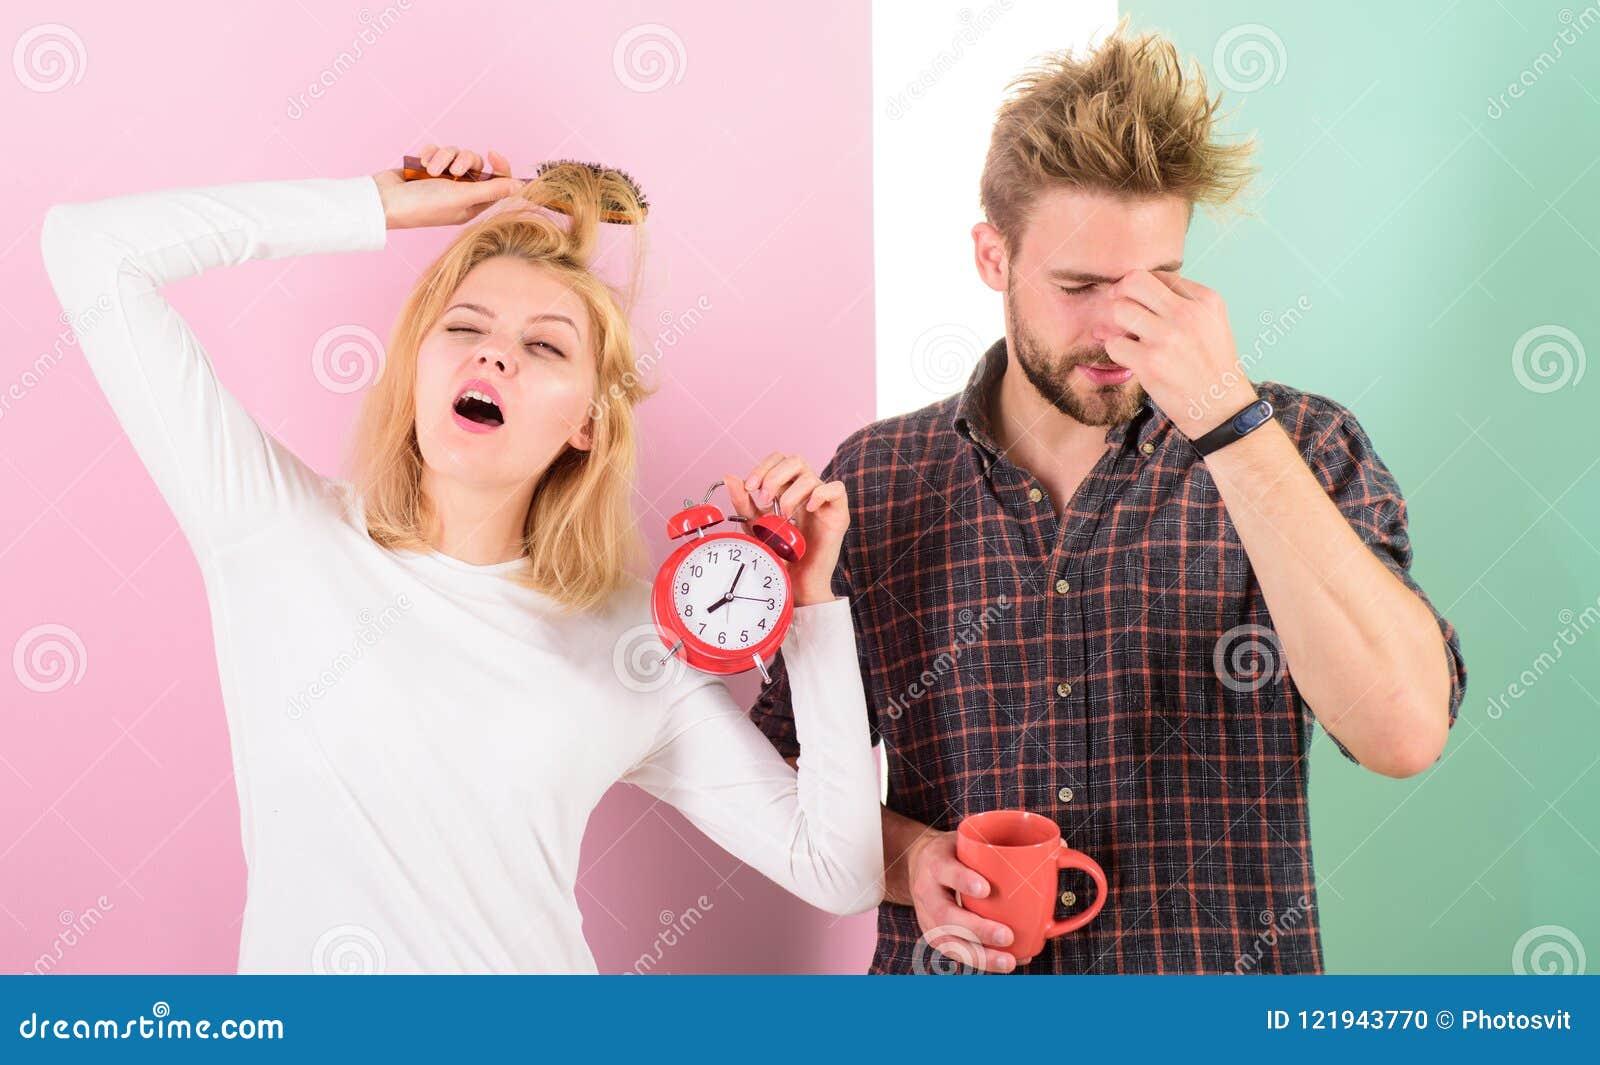 Lack of sleep. Couple sleep not enough time. Family drink morning coffee yawning faces. Couple oversleep awakening hold